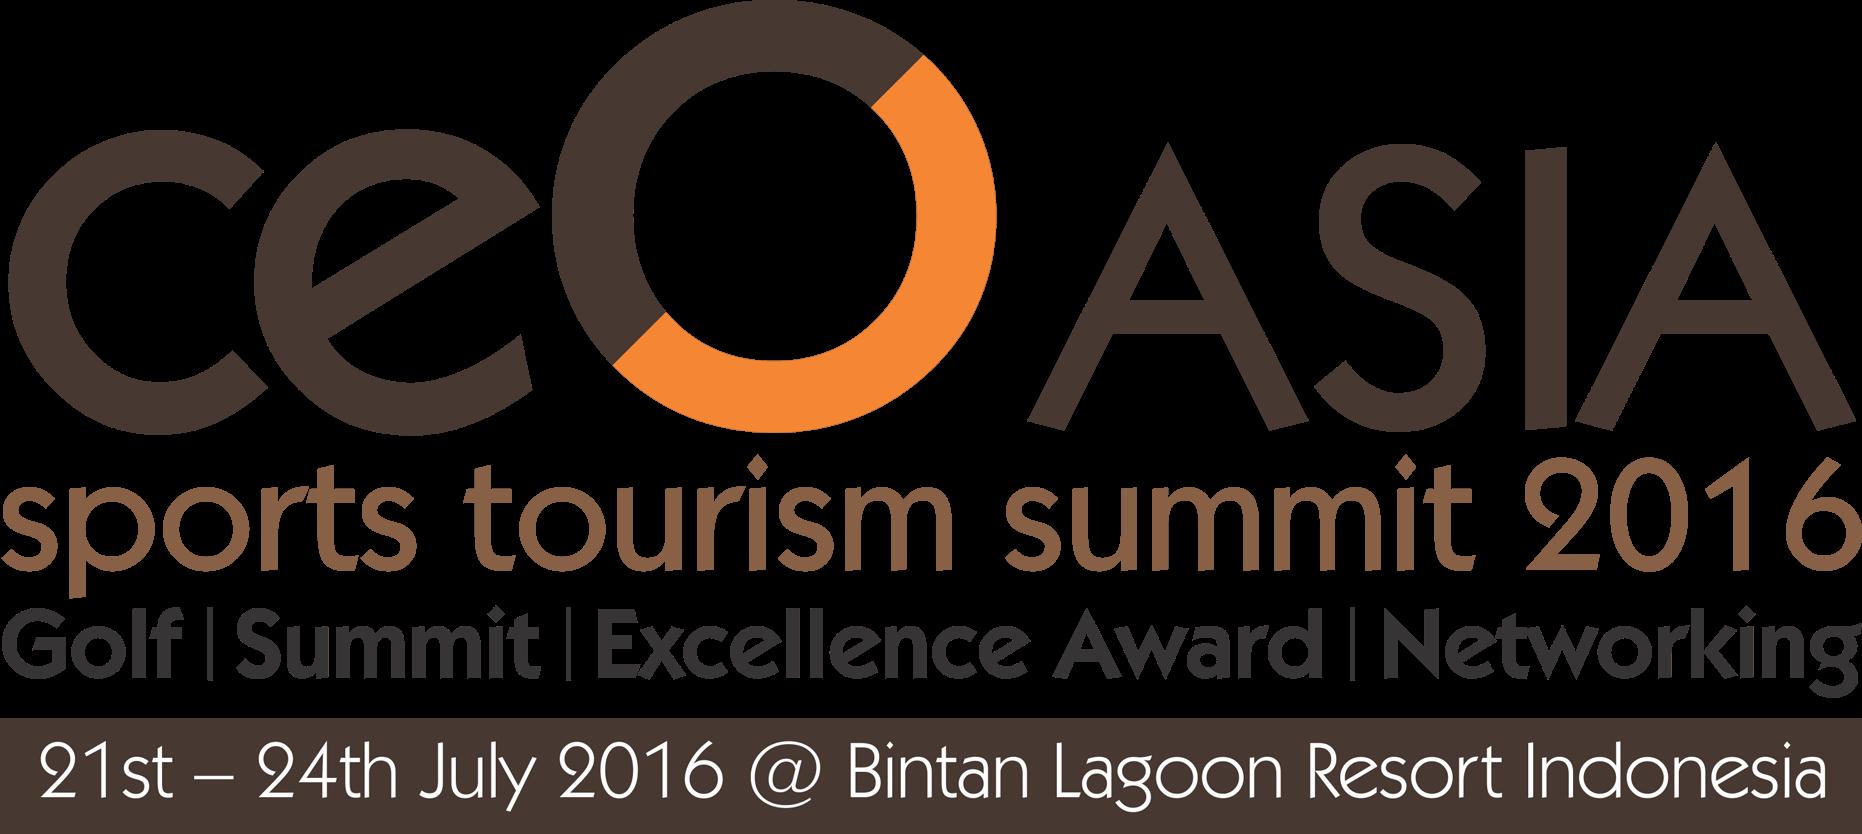 Award Recipients 2016 (Golf Club U0026 Resorts) - Asia Golfing Network, Transparent background PNG HD thumbnail